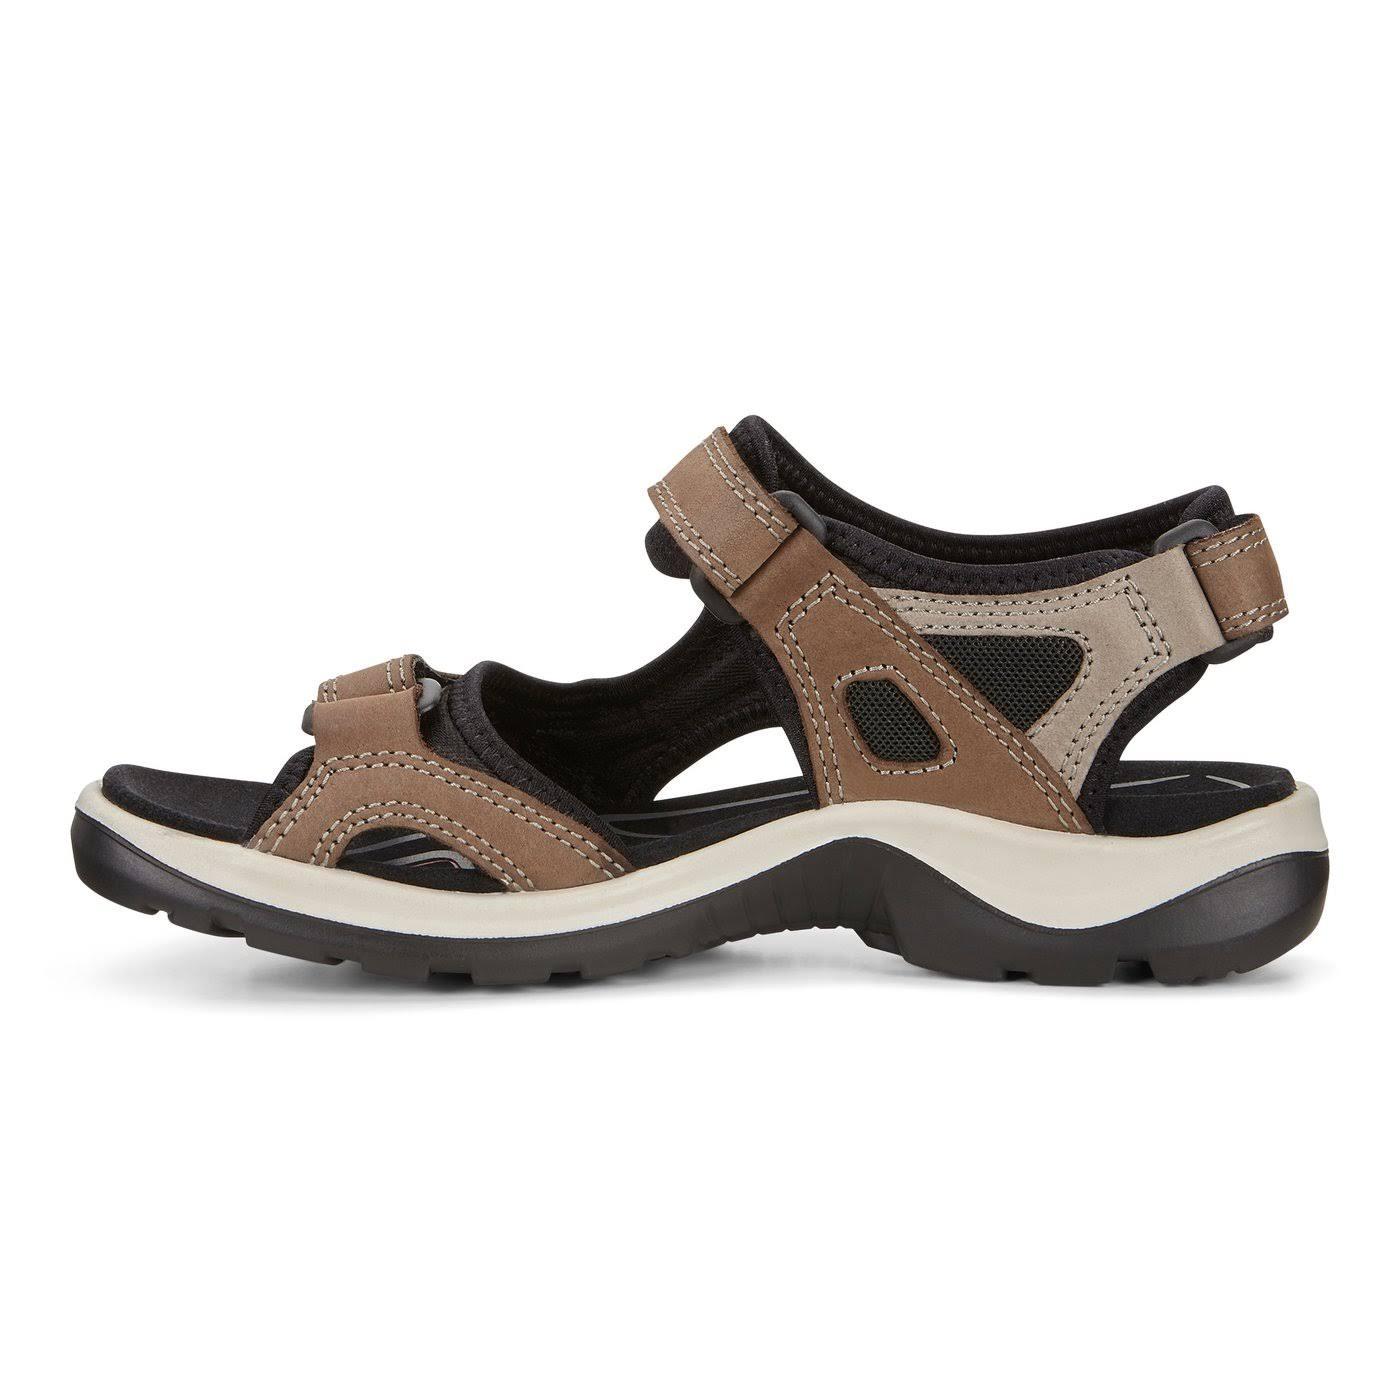 Birke 69563 Yucatan Leder Ecco Textil Womens Sandal HxFqwx5IS